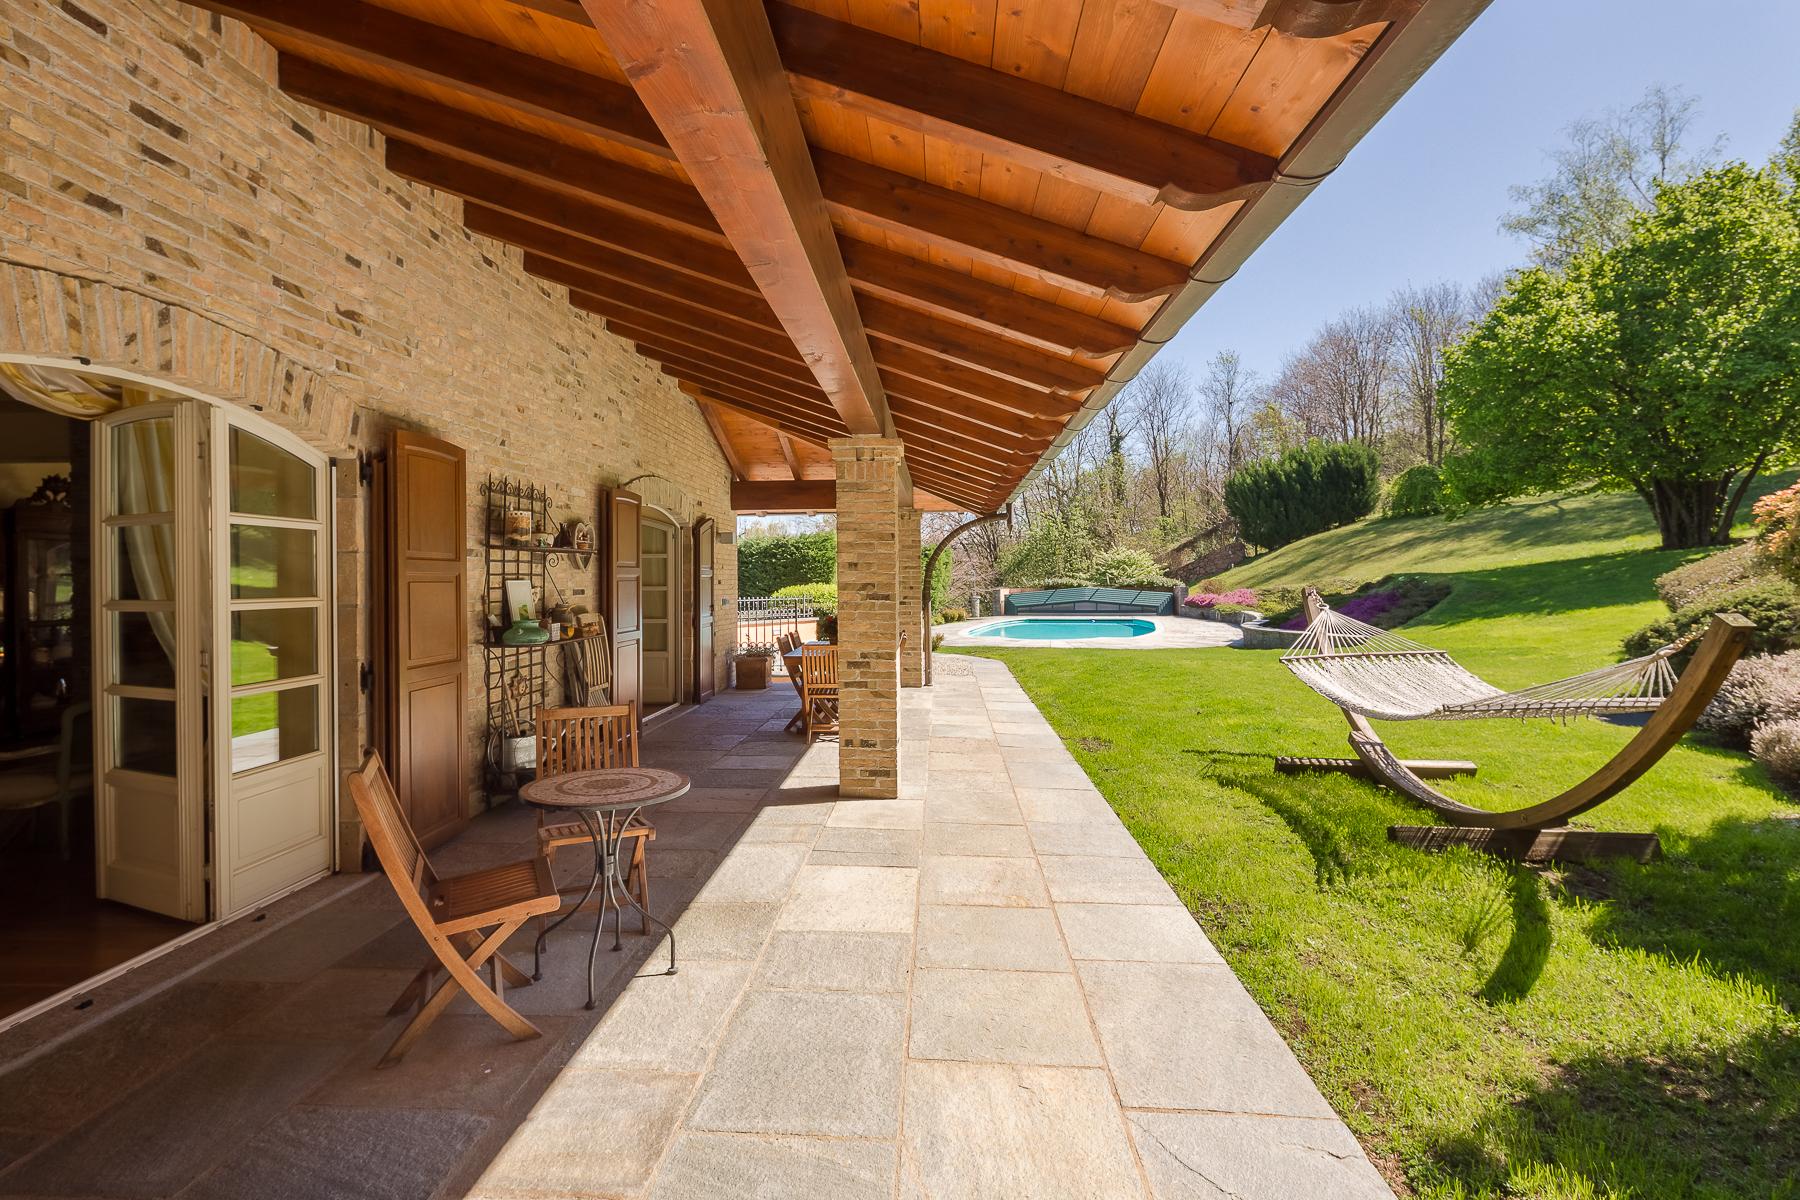 Villa in Vendita a Varese: 5 locali, 470 mq - Foto 7